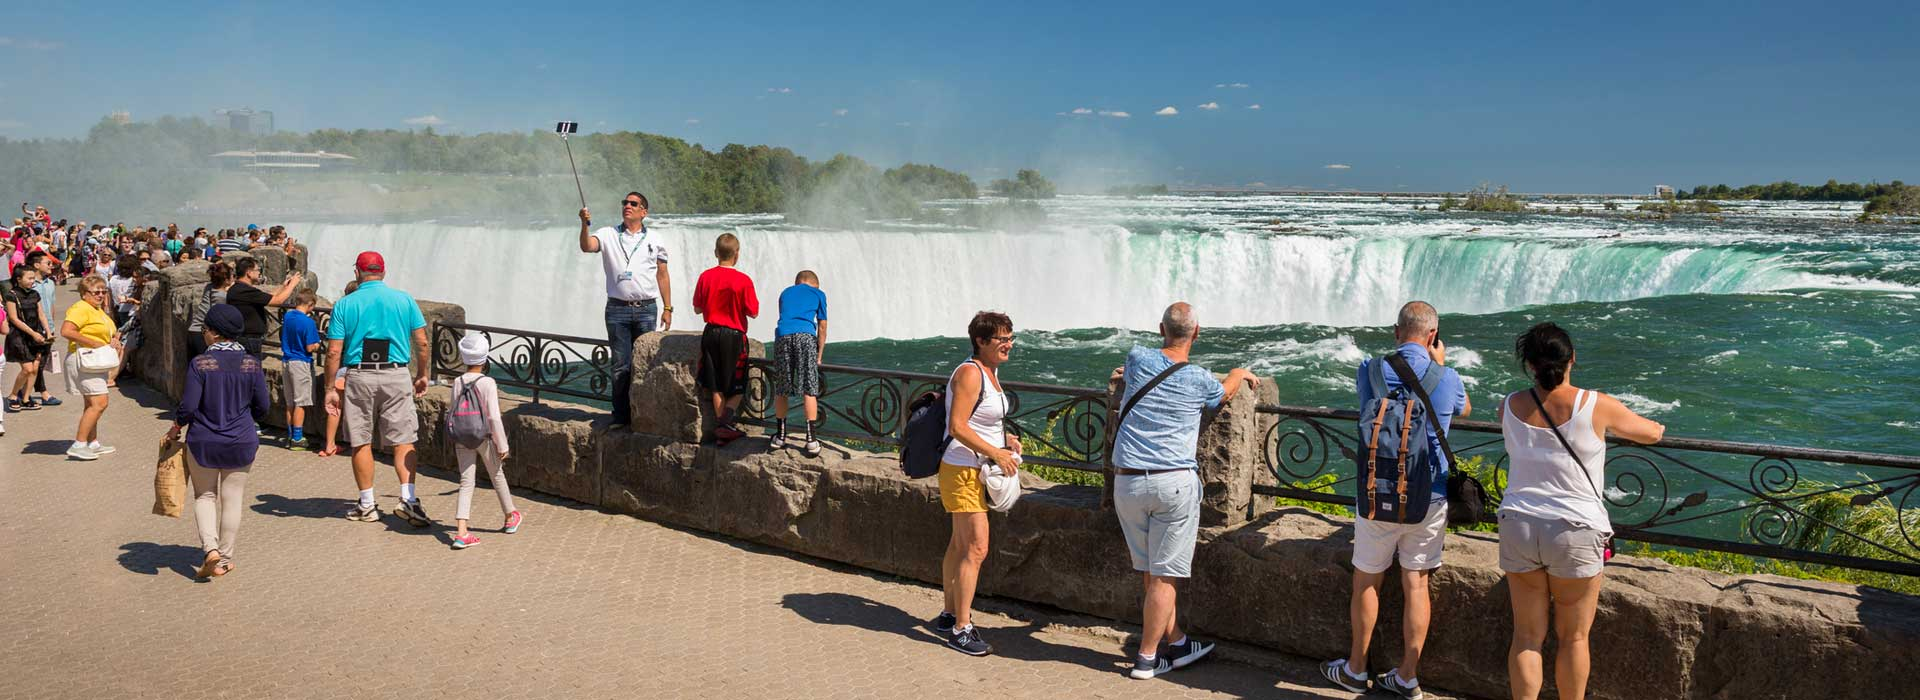 Toronto to Niagara Falls Half Day Private Tour (upto 4 people)